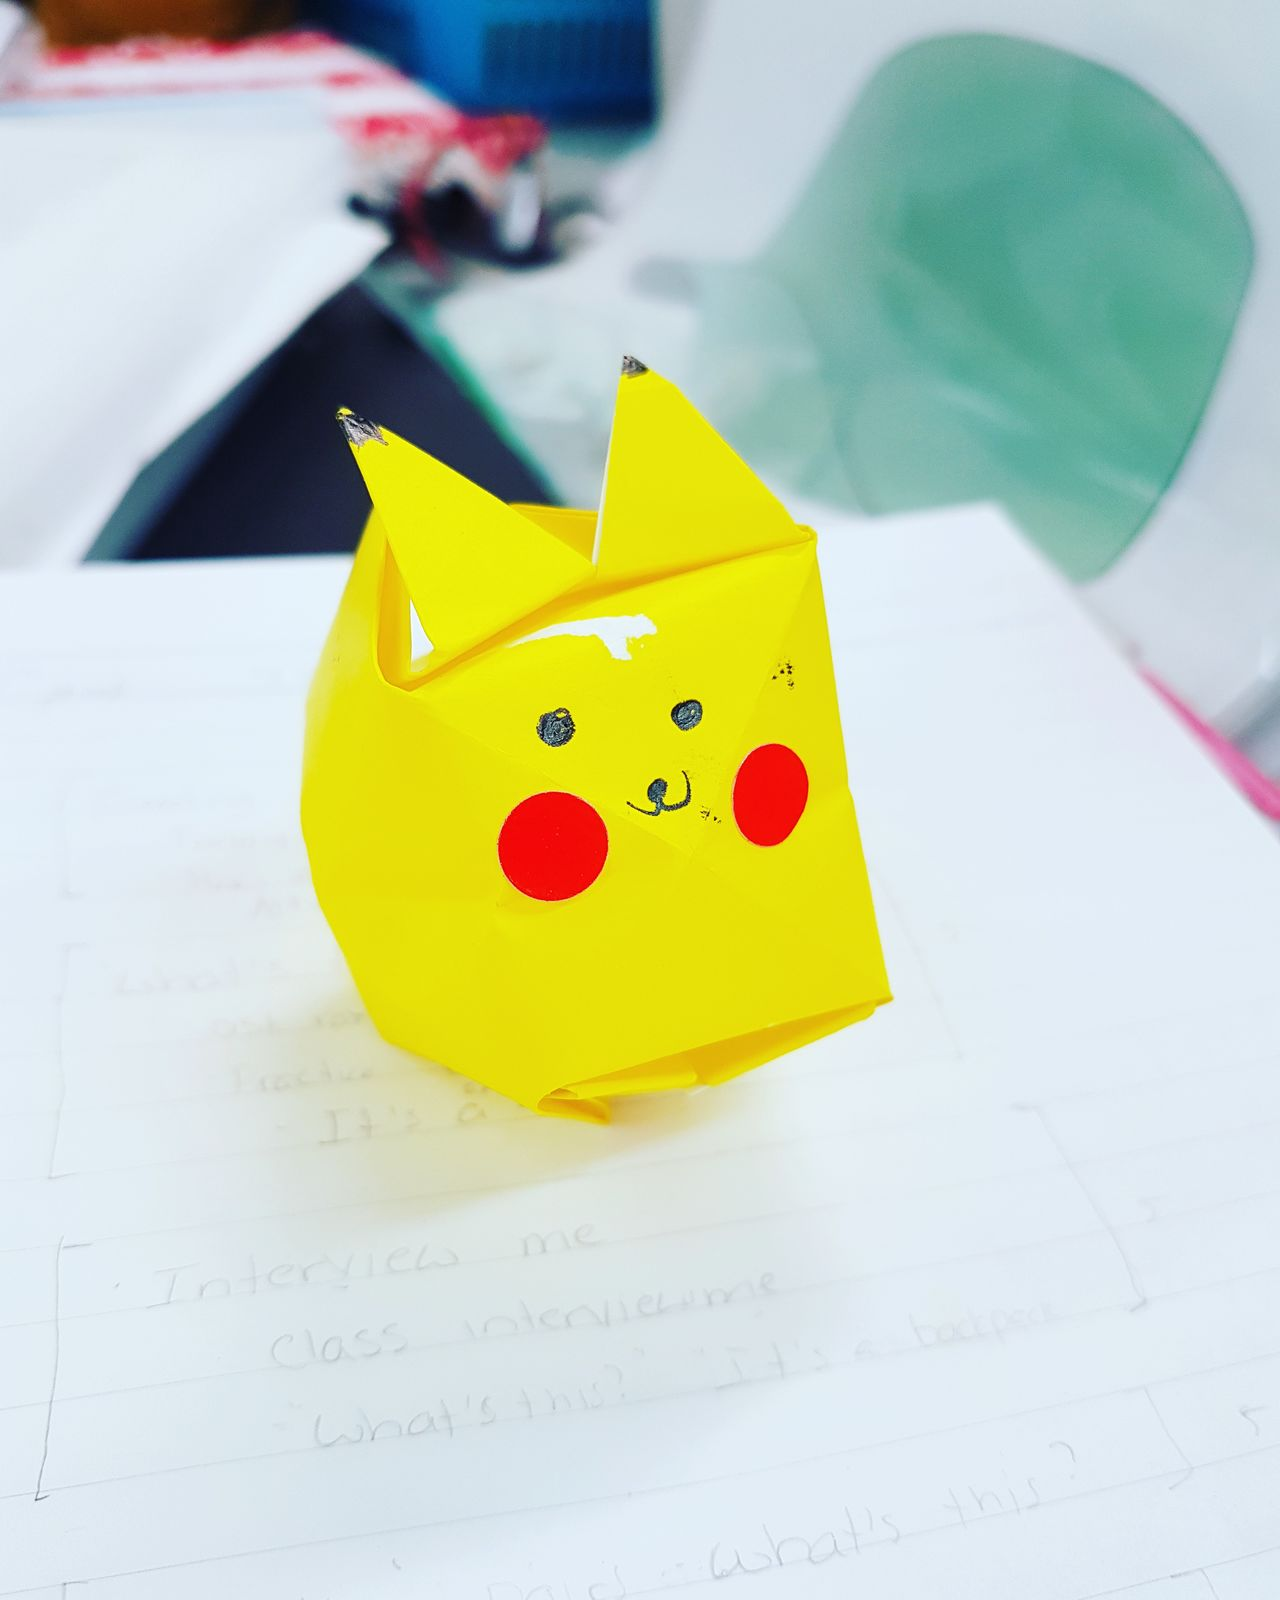 Pikachu origami Origami Pikachu Pokémon Yellow Craft Papercraft No People Close-up Indoors  First Eyeem Photo